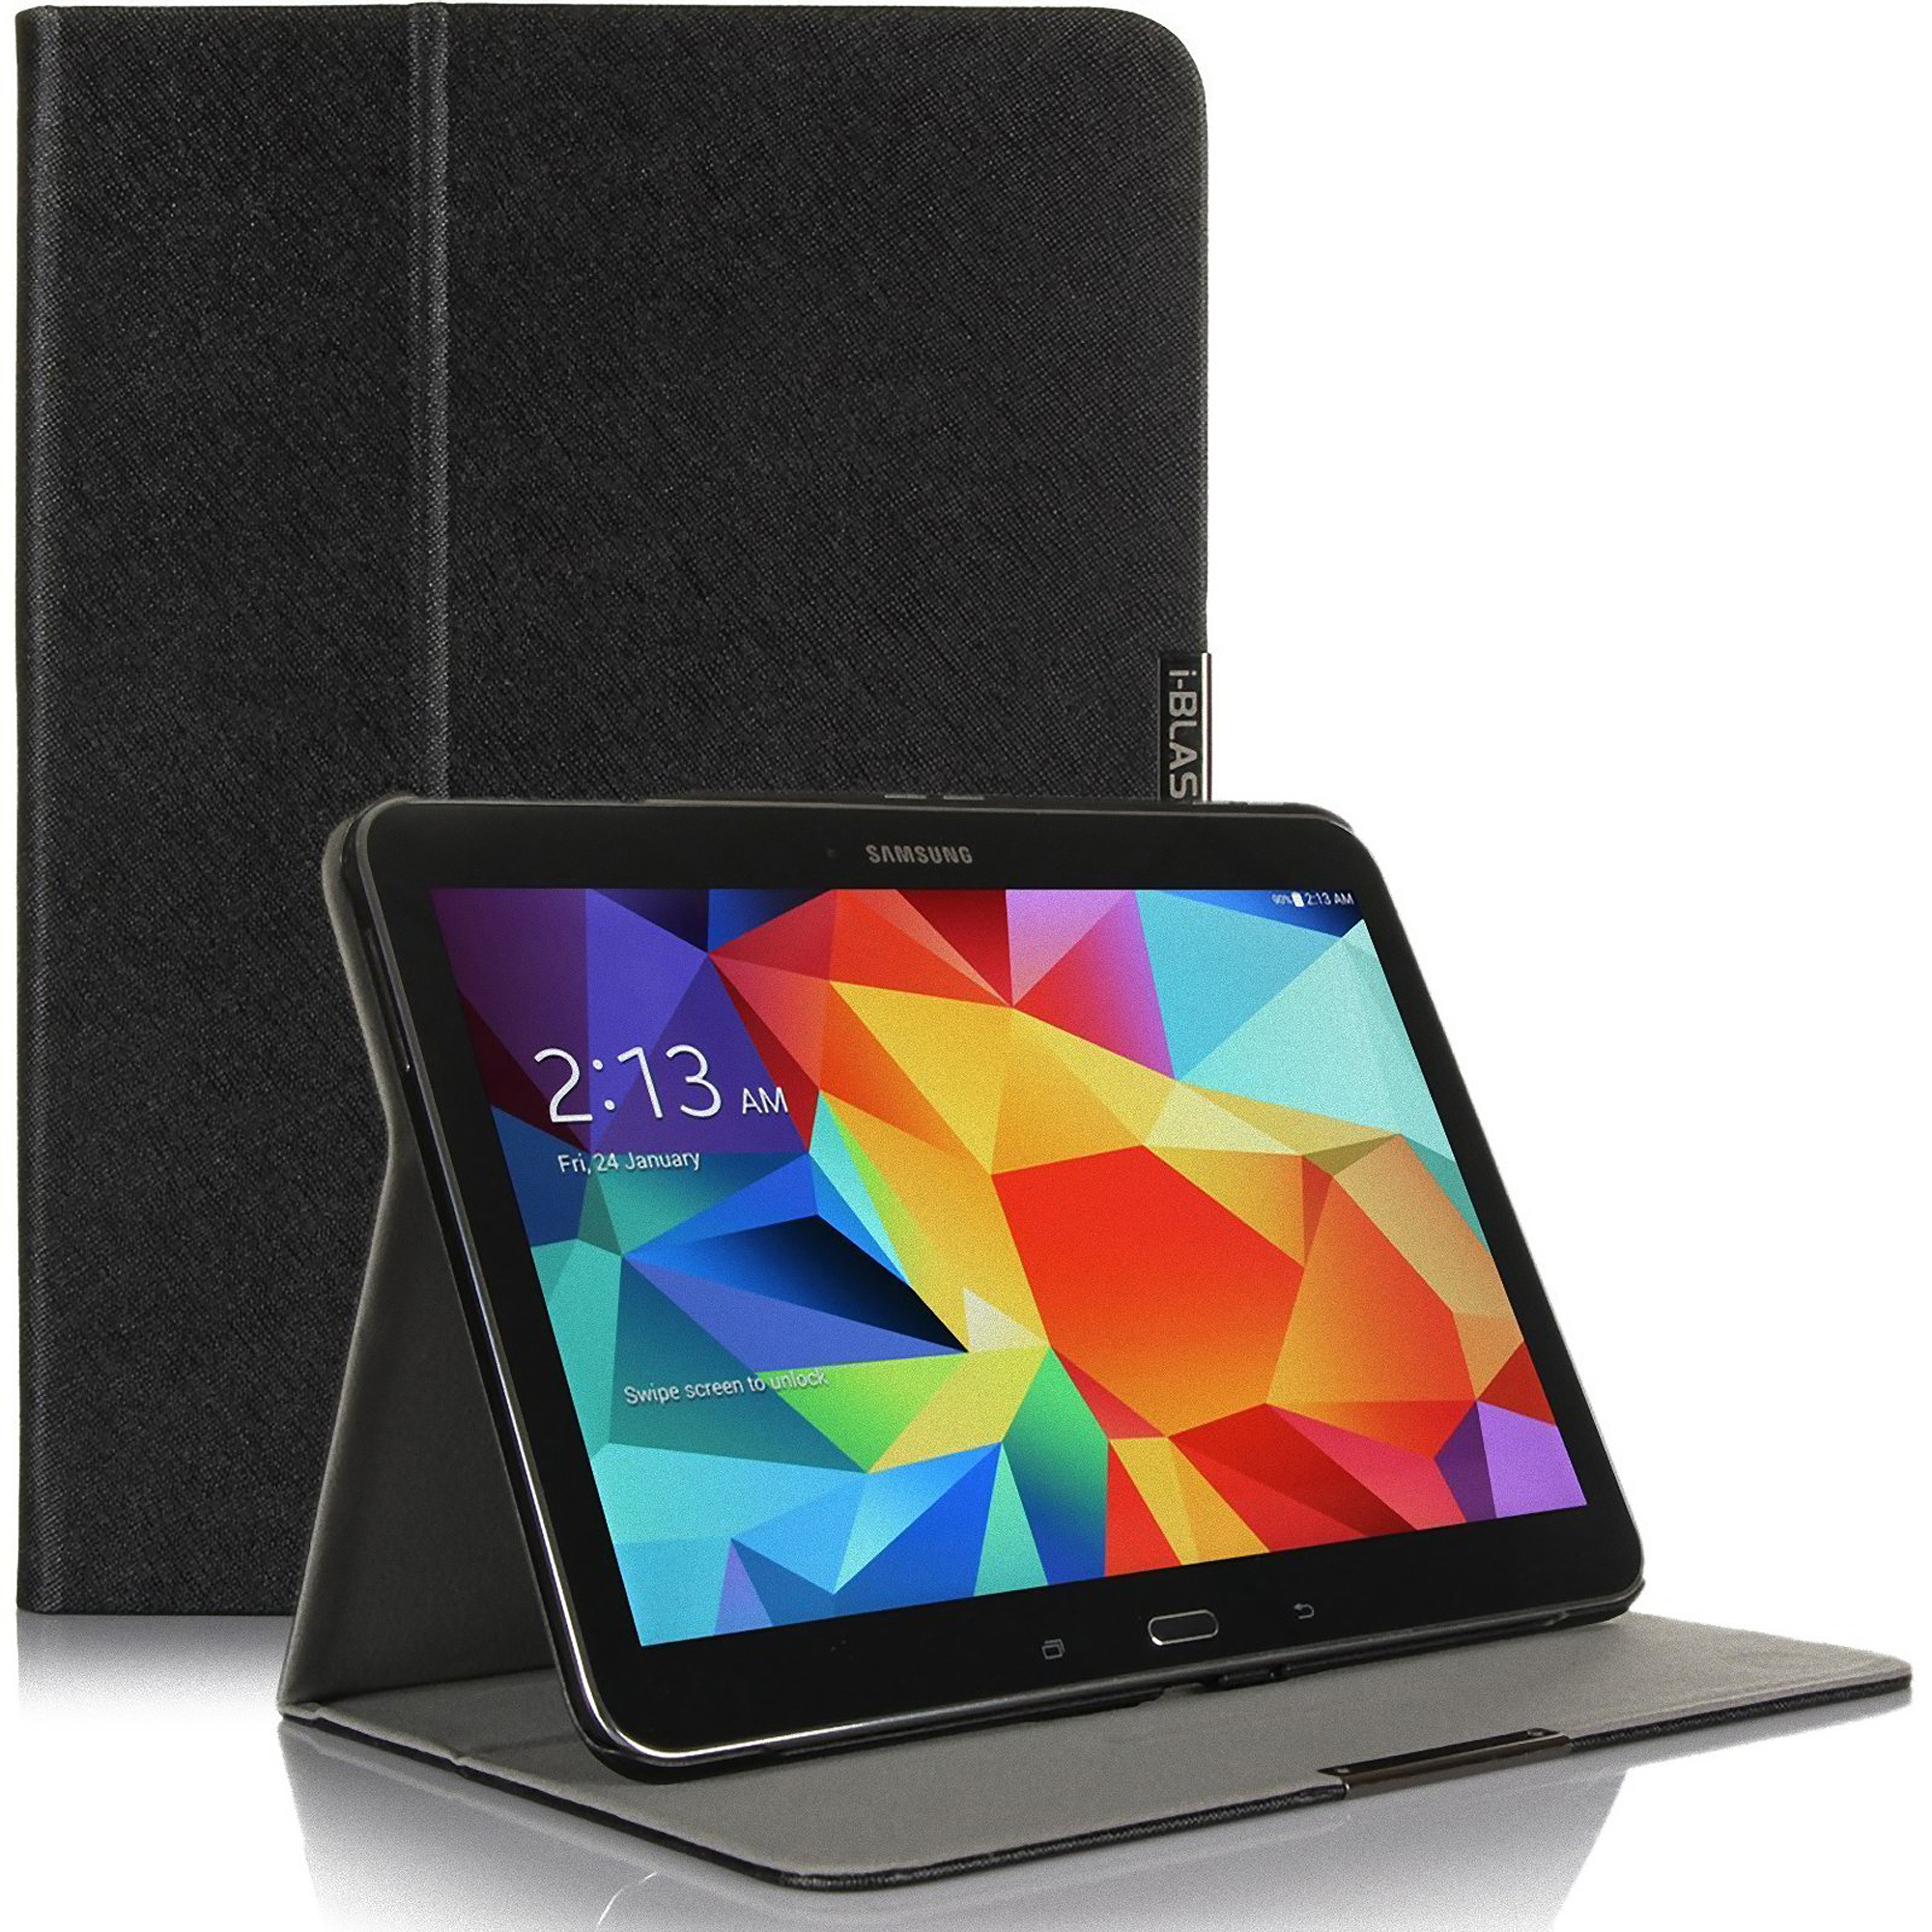 i-Blason Executive Hard Shell Stand Case for Samsung Galaxy Tab 4 10.1, Black